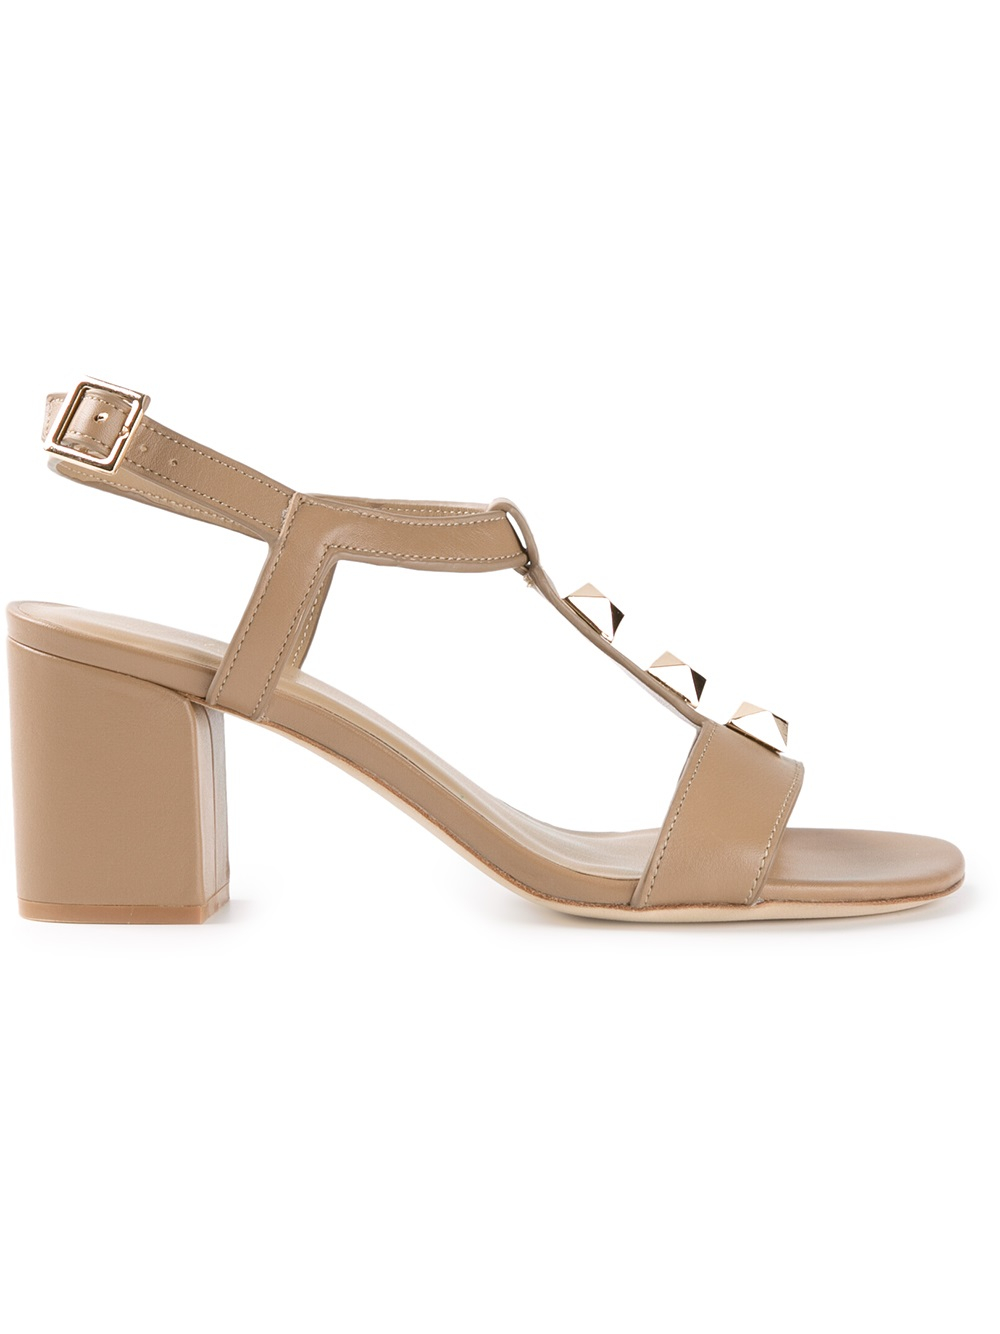 Lola Cruz Studded Tbar Sandal In Beige Nude Amp Neutrals